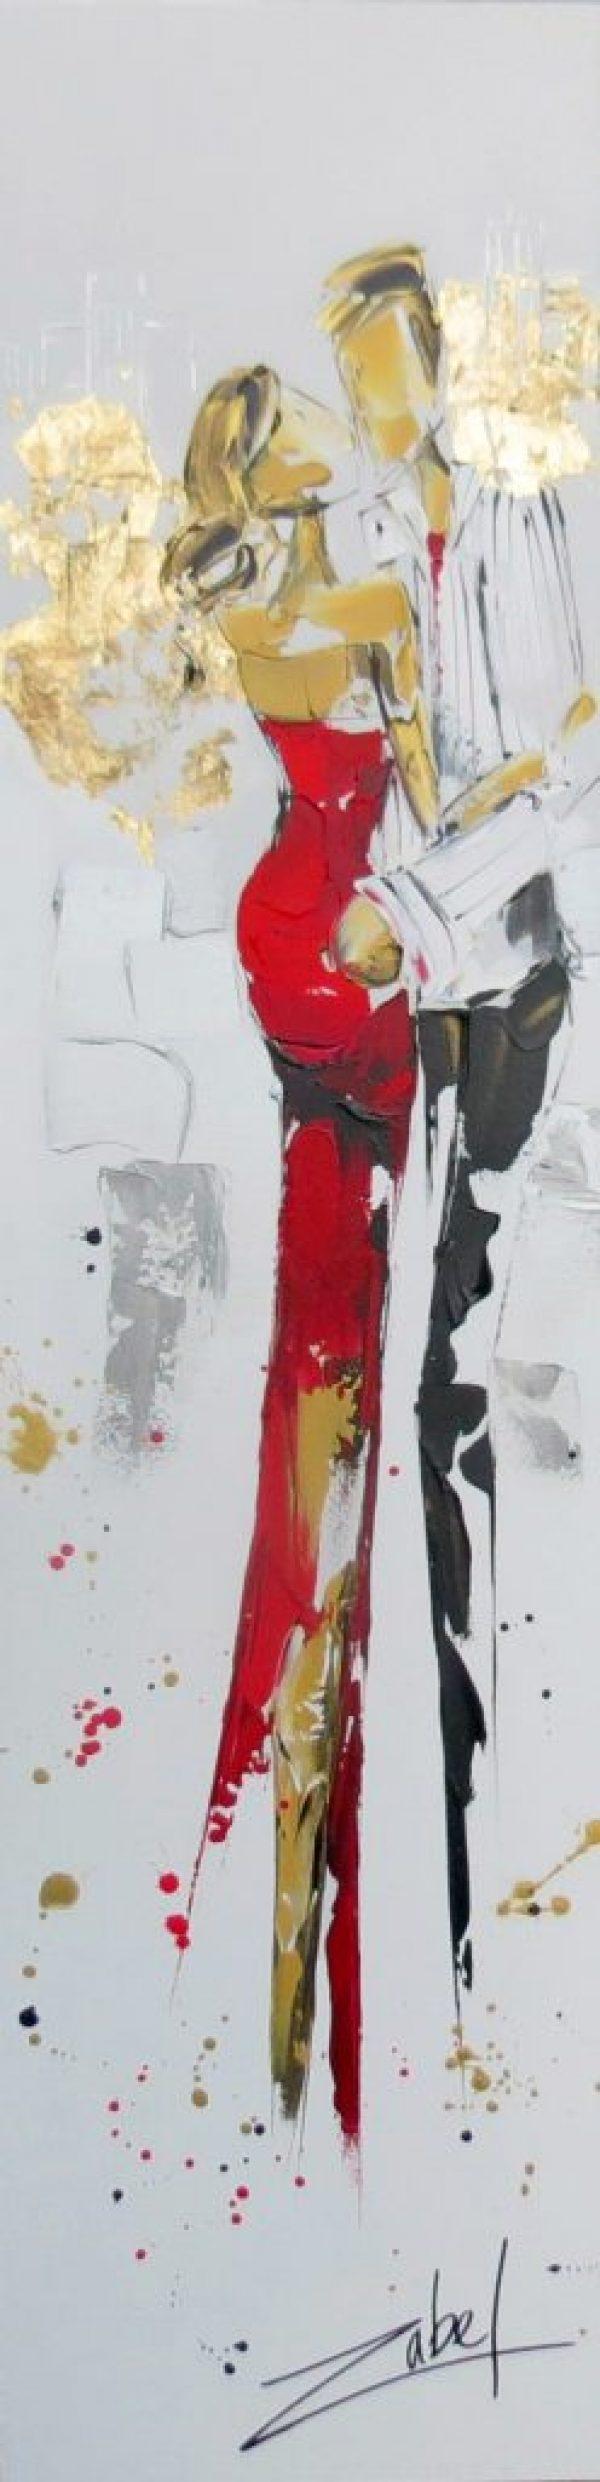 Zabel - Rouge Passion 12x48